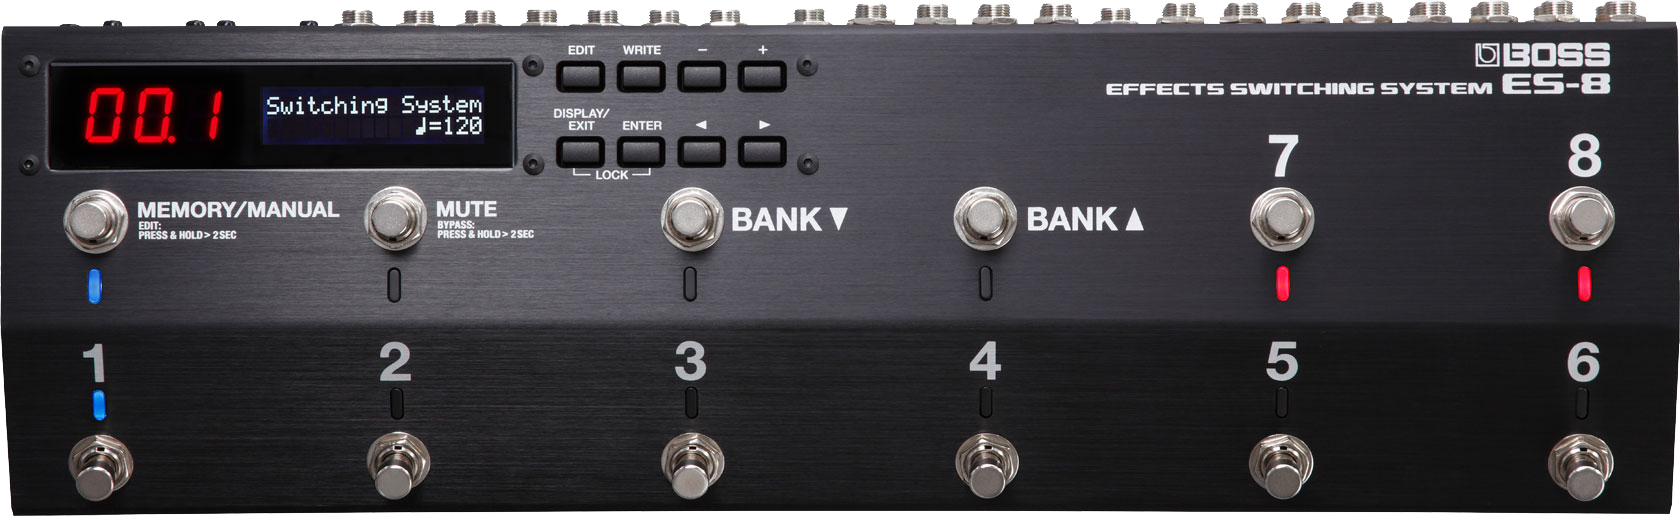 boss-es 8 switch